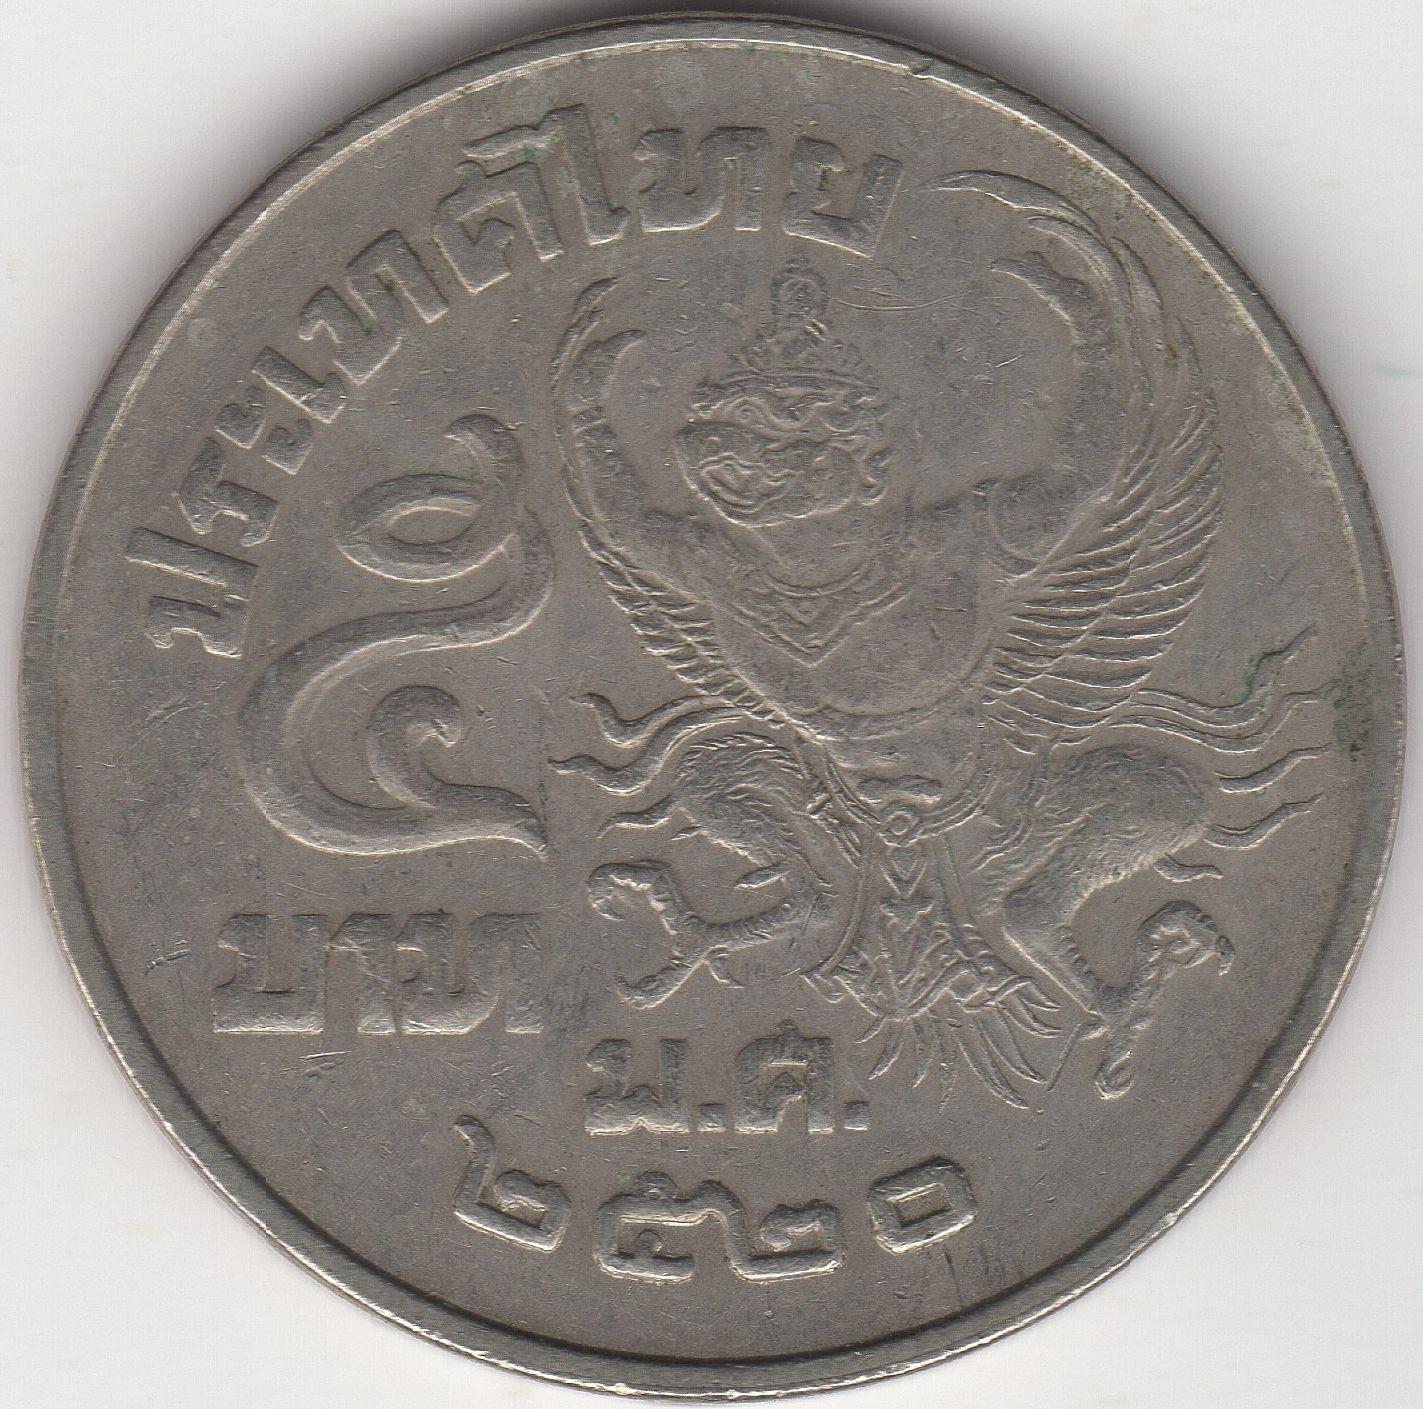 Thailand Rama Ix 5 Baht Coin World Coins Pennies2pounds